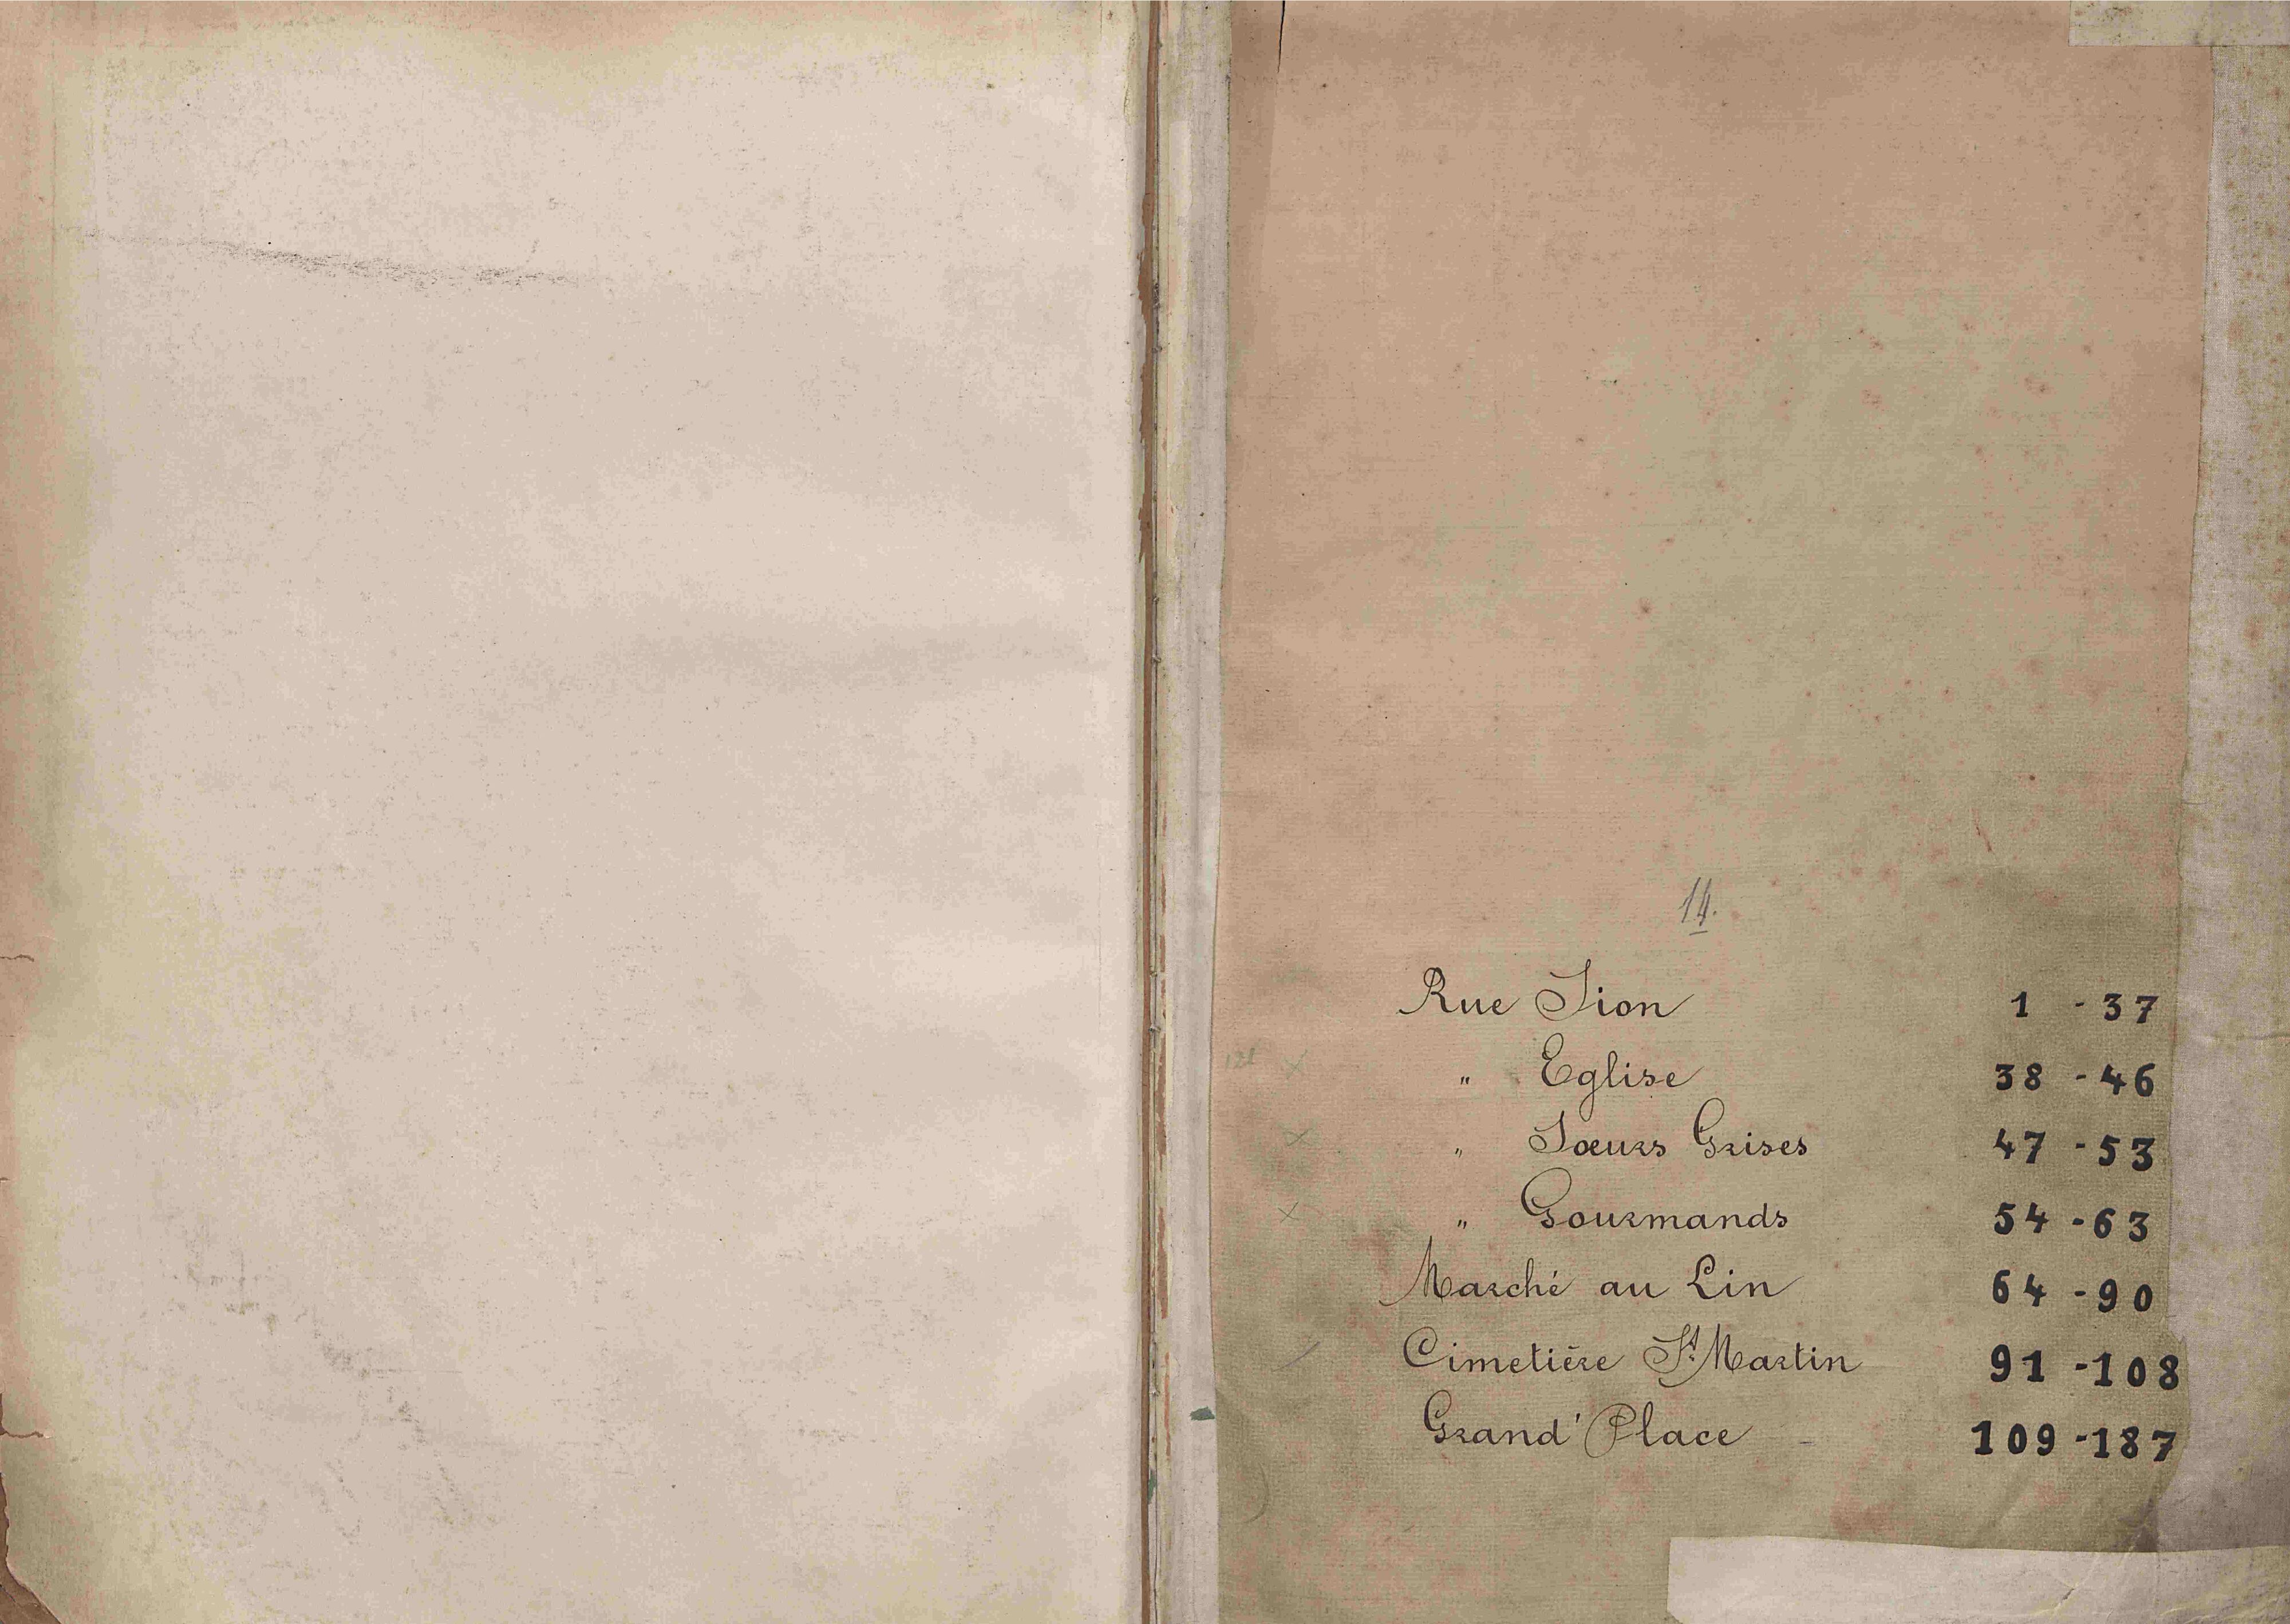 Bevolkingsregister Kortrijk 1890 boek 14